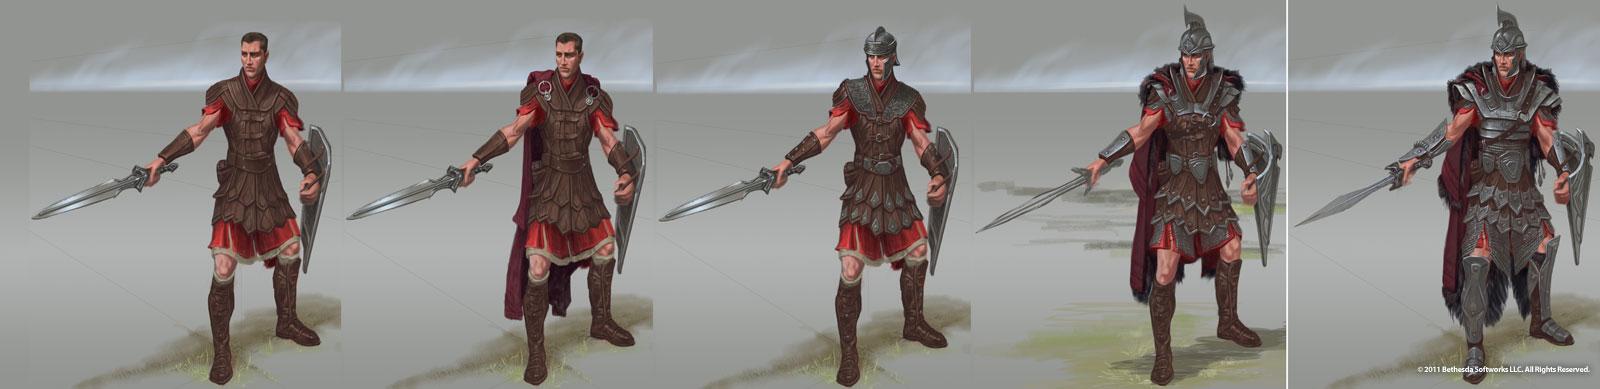 Имперский солдат